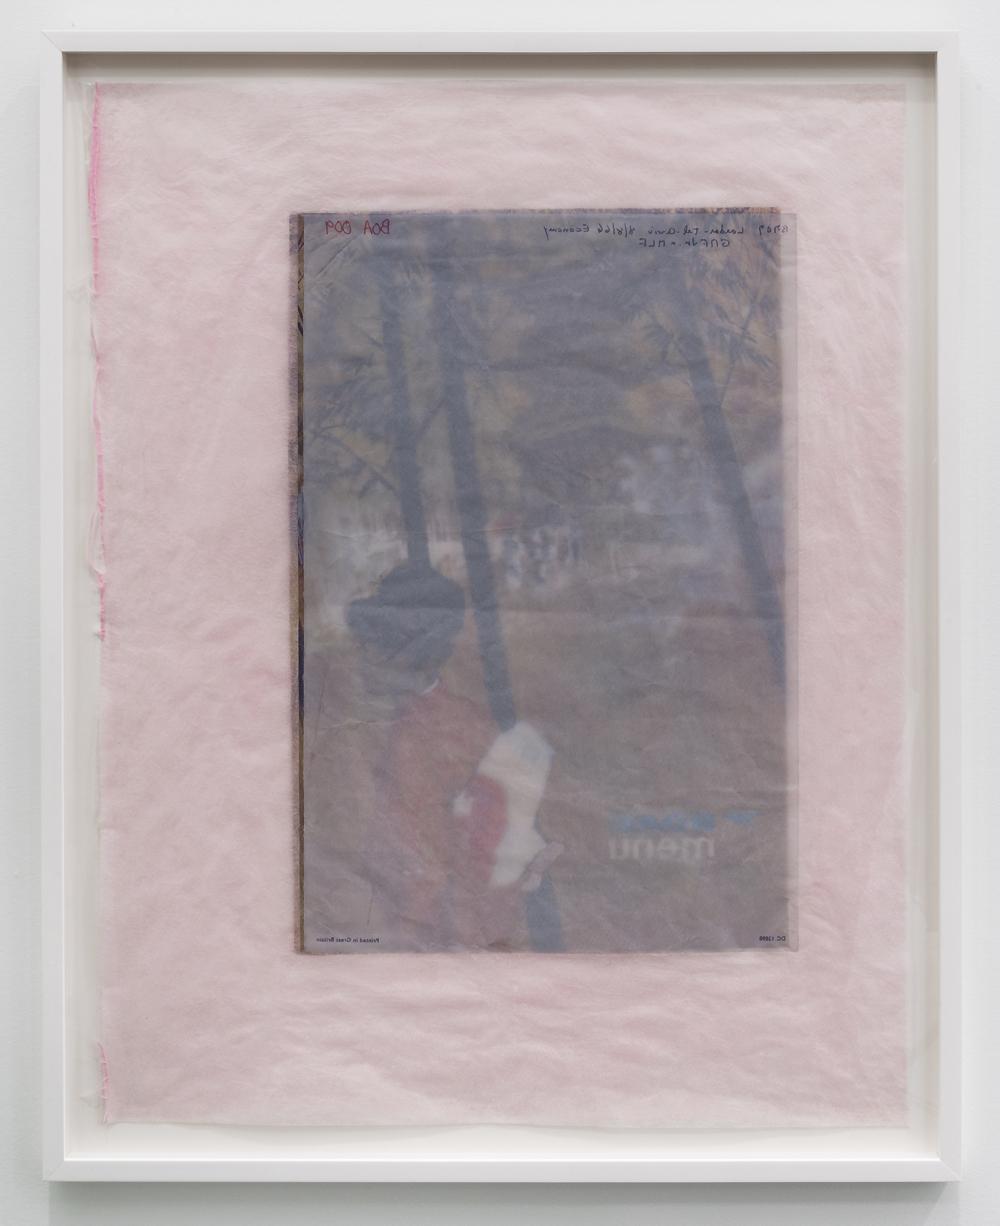 Valerie Snobeck / Catherine Sullivan,  Limited Good 6 , 2013, peeled prints and felt on plastic, 41 x 33 inch framed